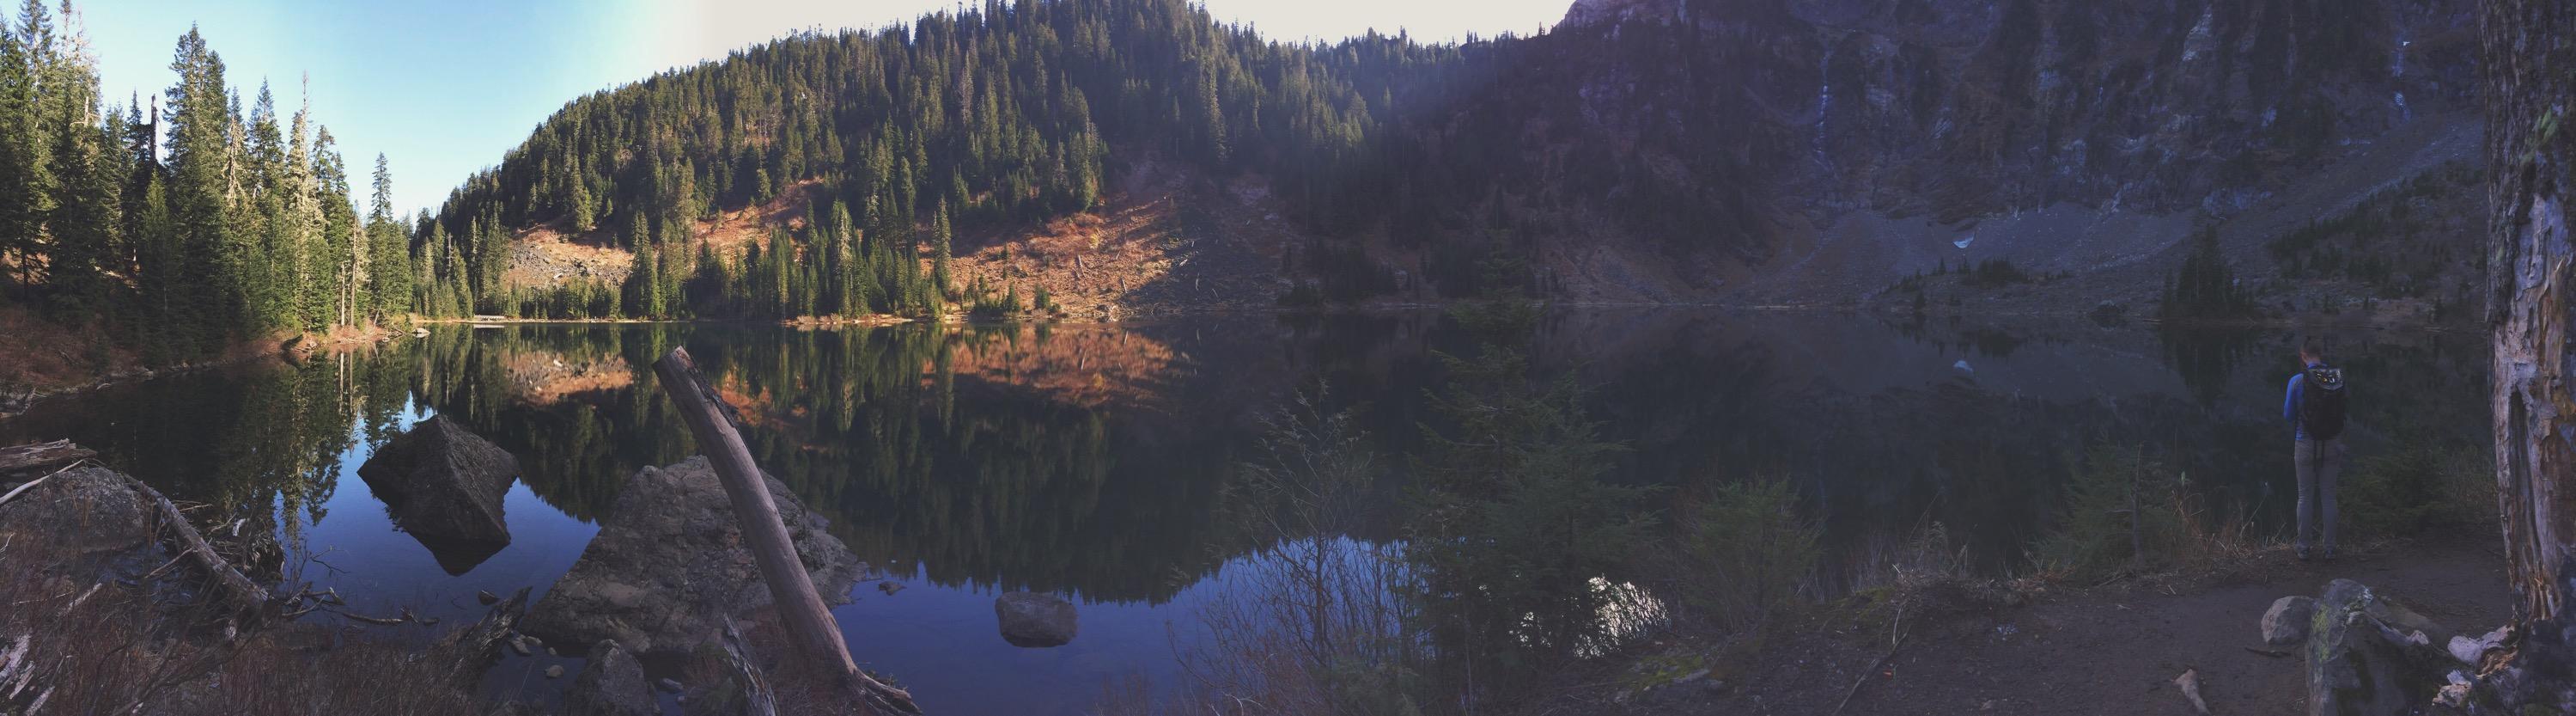 Lake22_Hike8